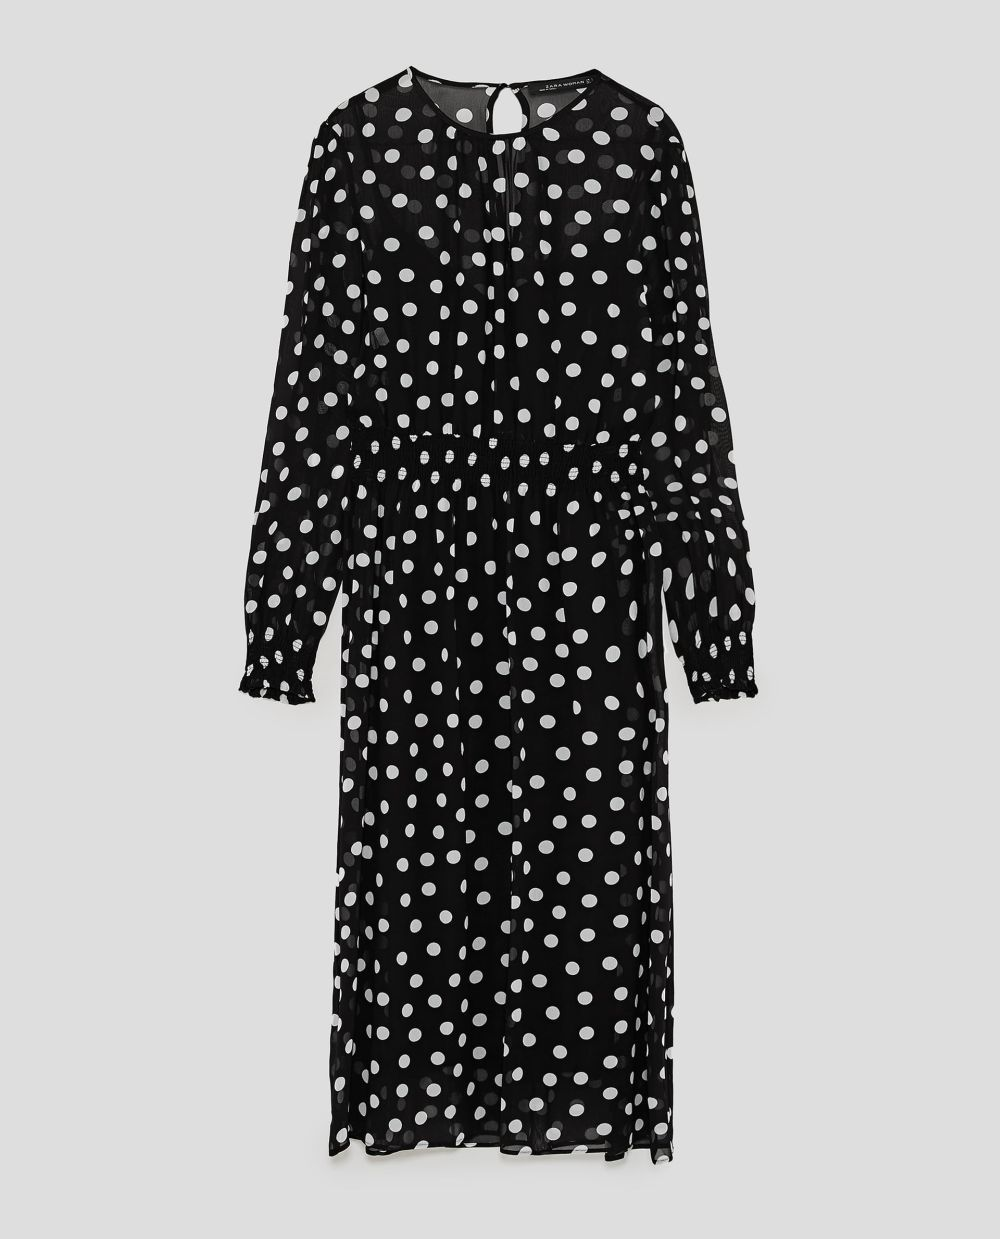 Vestido de lunares de Zara (49,95 euros)